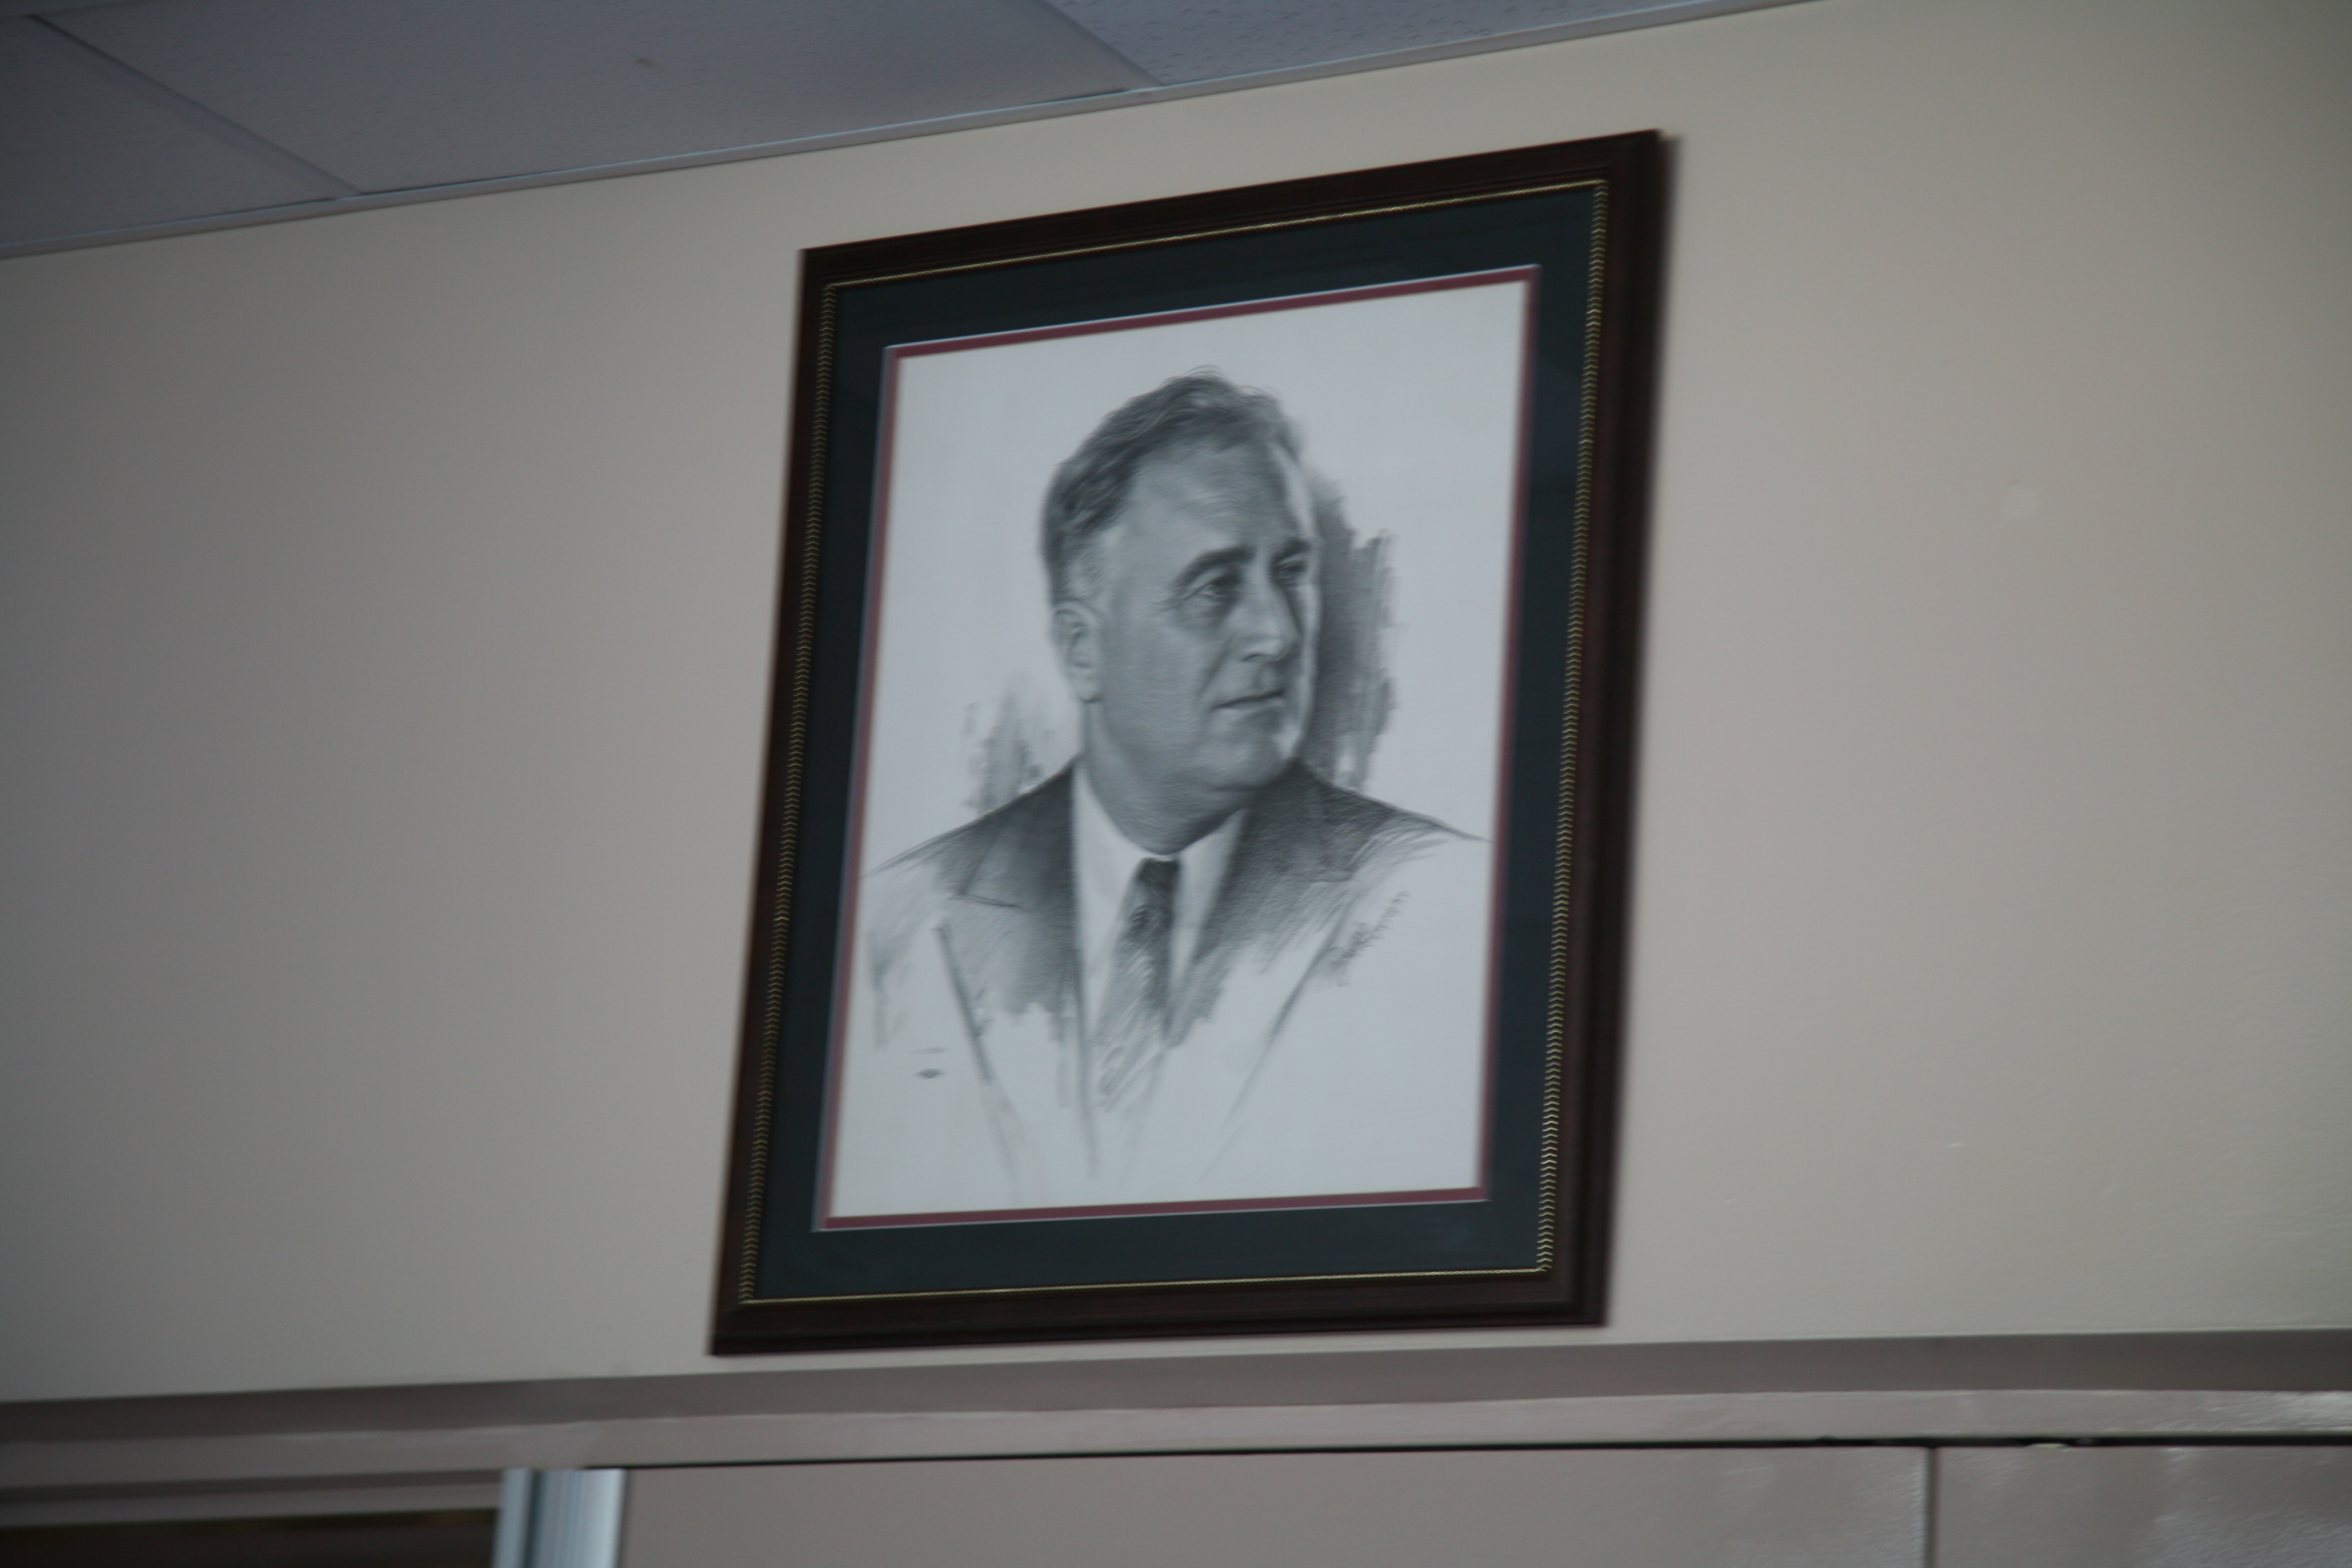 Roosevelt School FDR Portrait